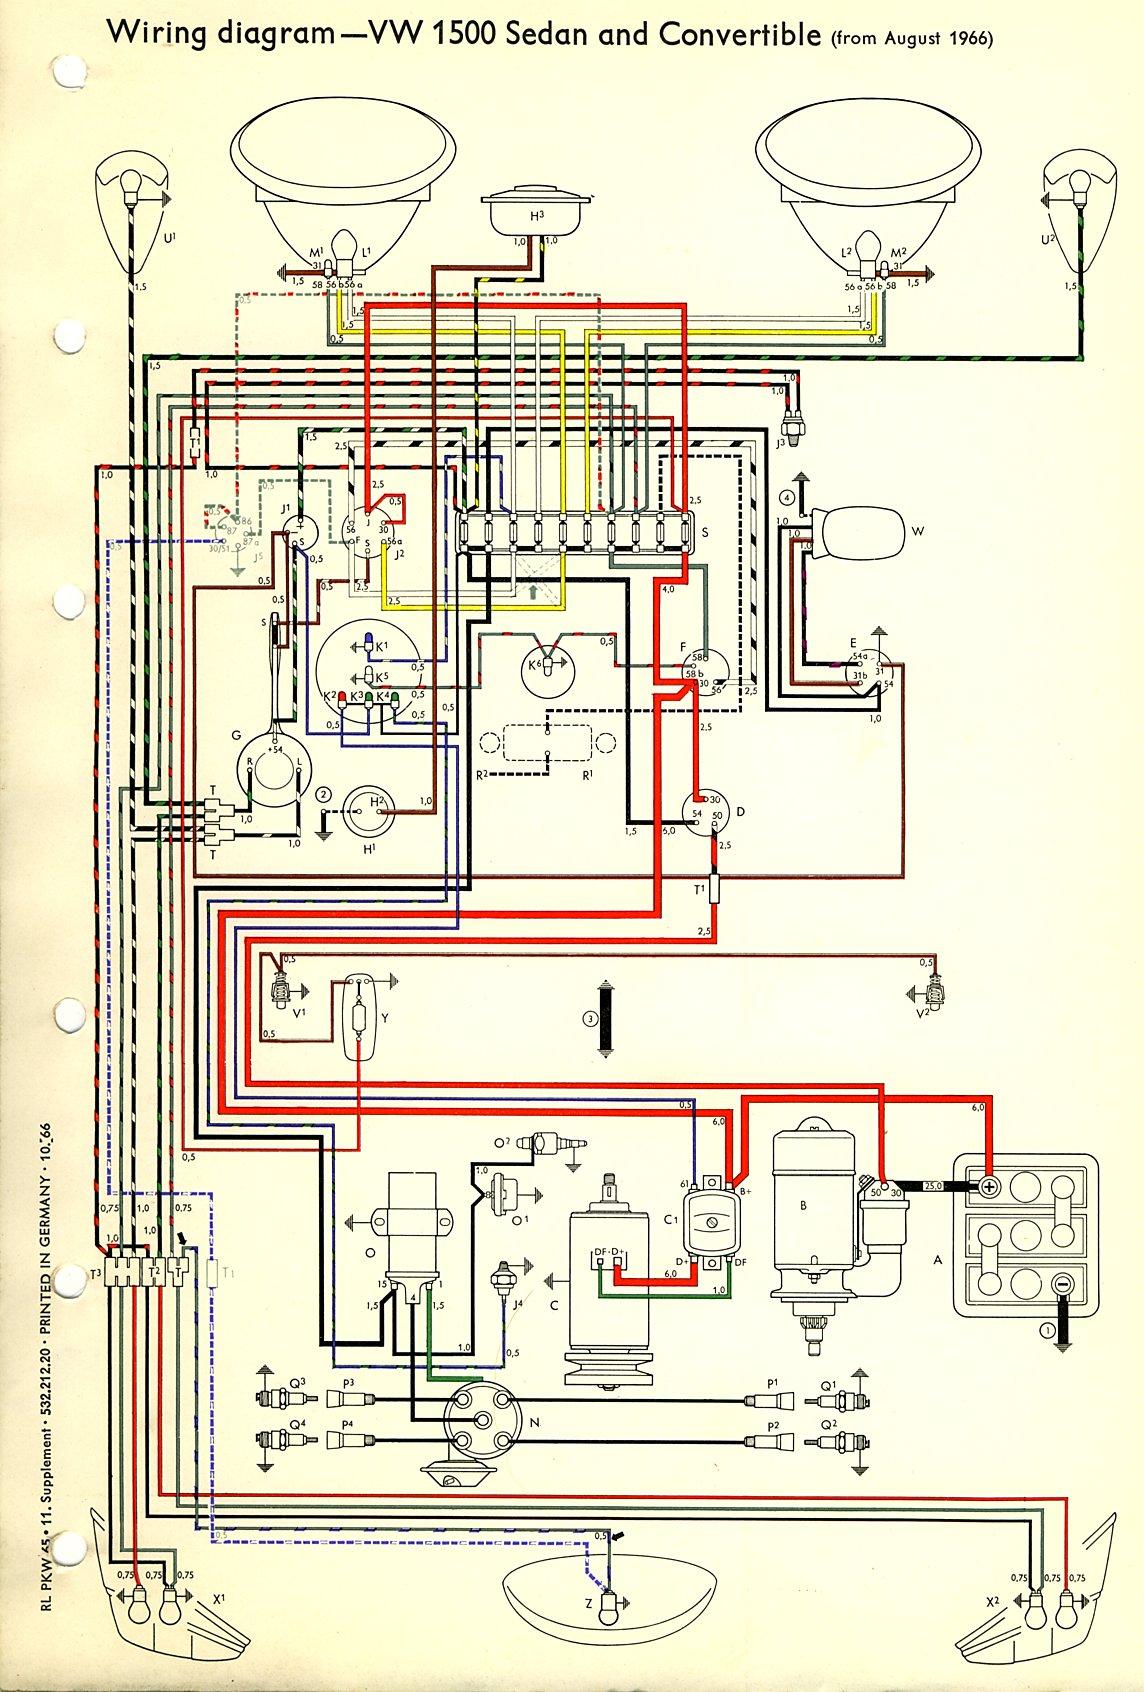 1967 Beetle Wiring Diagram TheGoldenBug Com